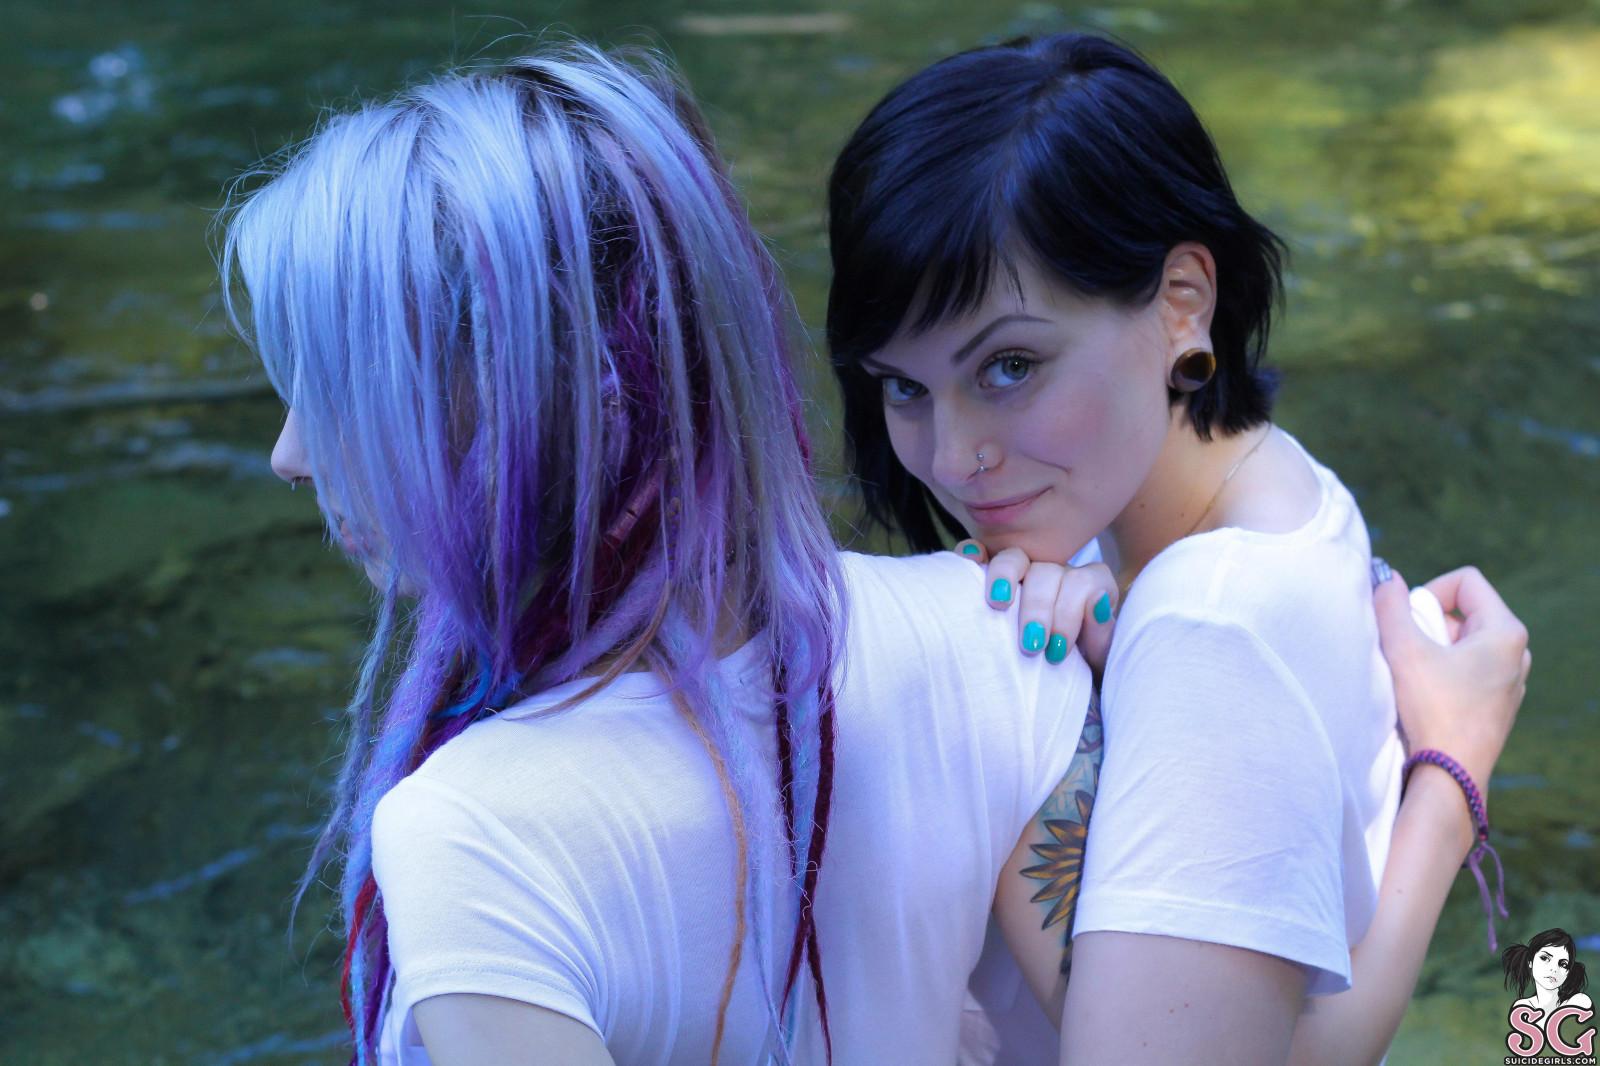 Wallpaper : women, cosplay, model, anime, blue eyes ...